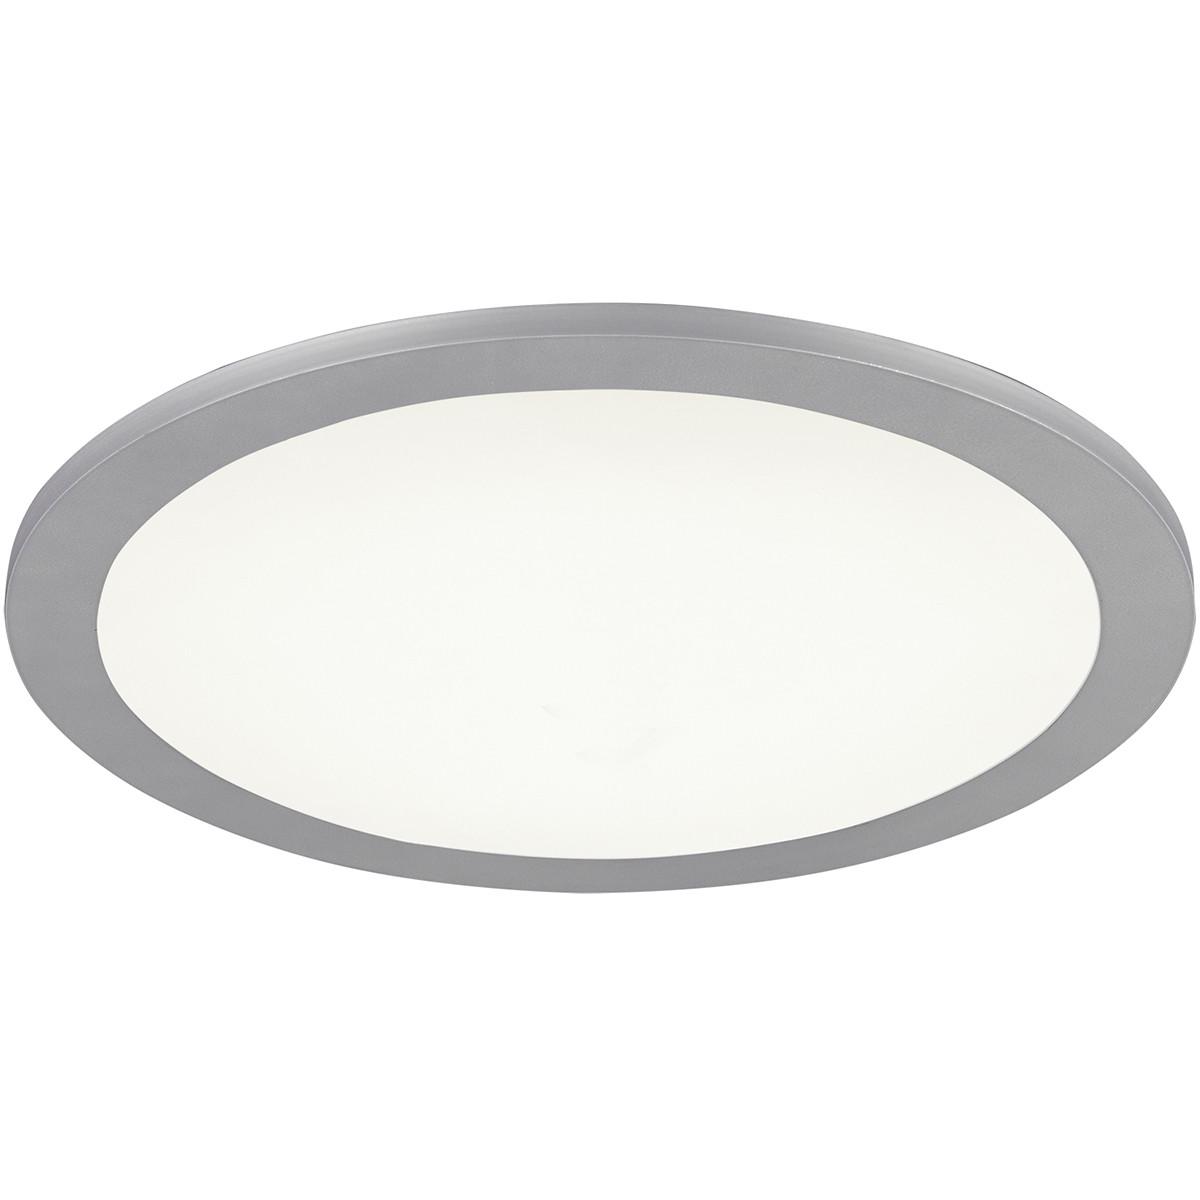 LED Plafondlamp WiZ - Trion Alineon - Slimme LED - Dimbaar - Aanpasbare Kleur - 15W - Mat Titaan - R